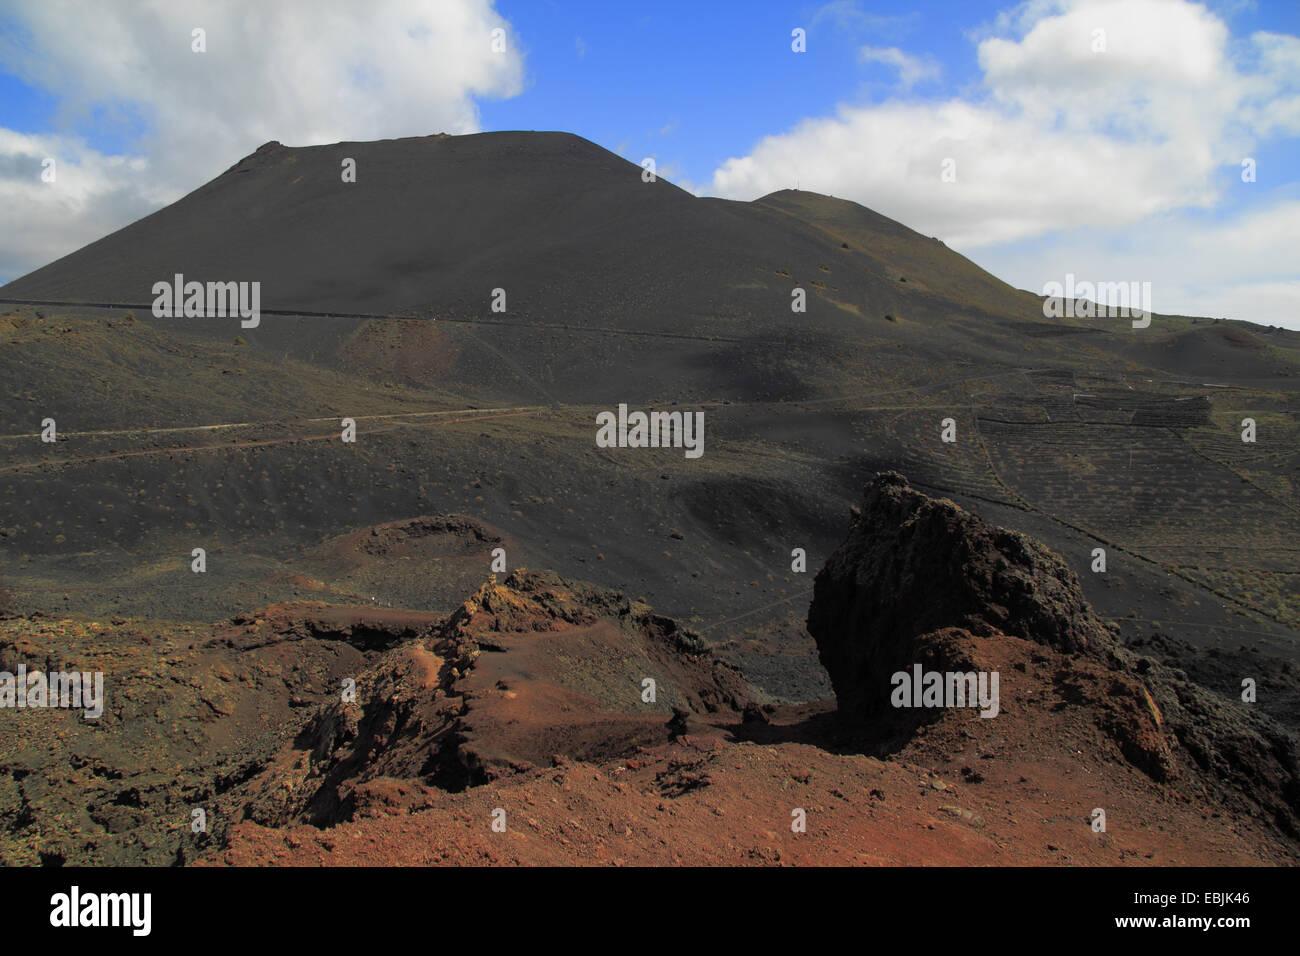 Blick vom Vulkan Teneguia am Krater des San Antonio, Kanarische Inseln, La Palma, Vulkan de San Antonio Stockbild